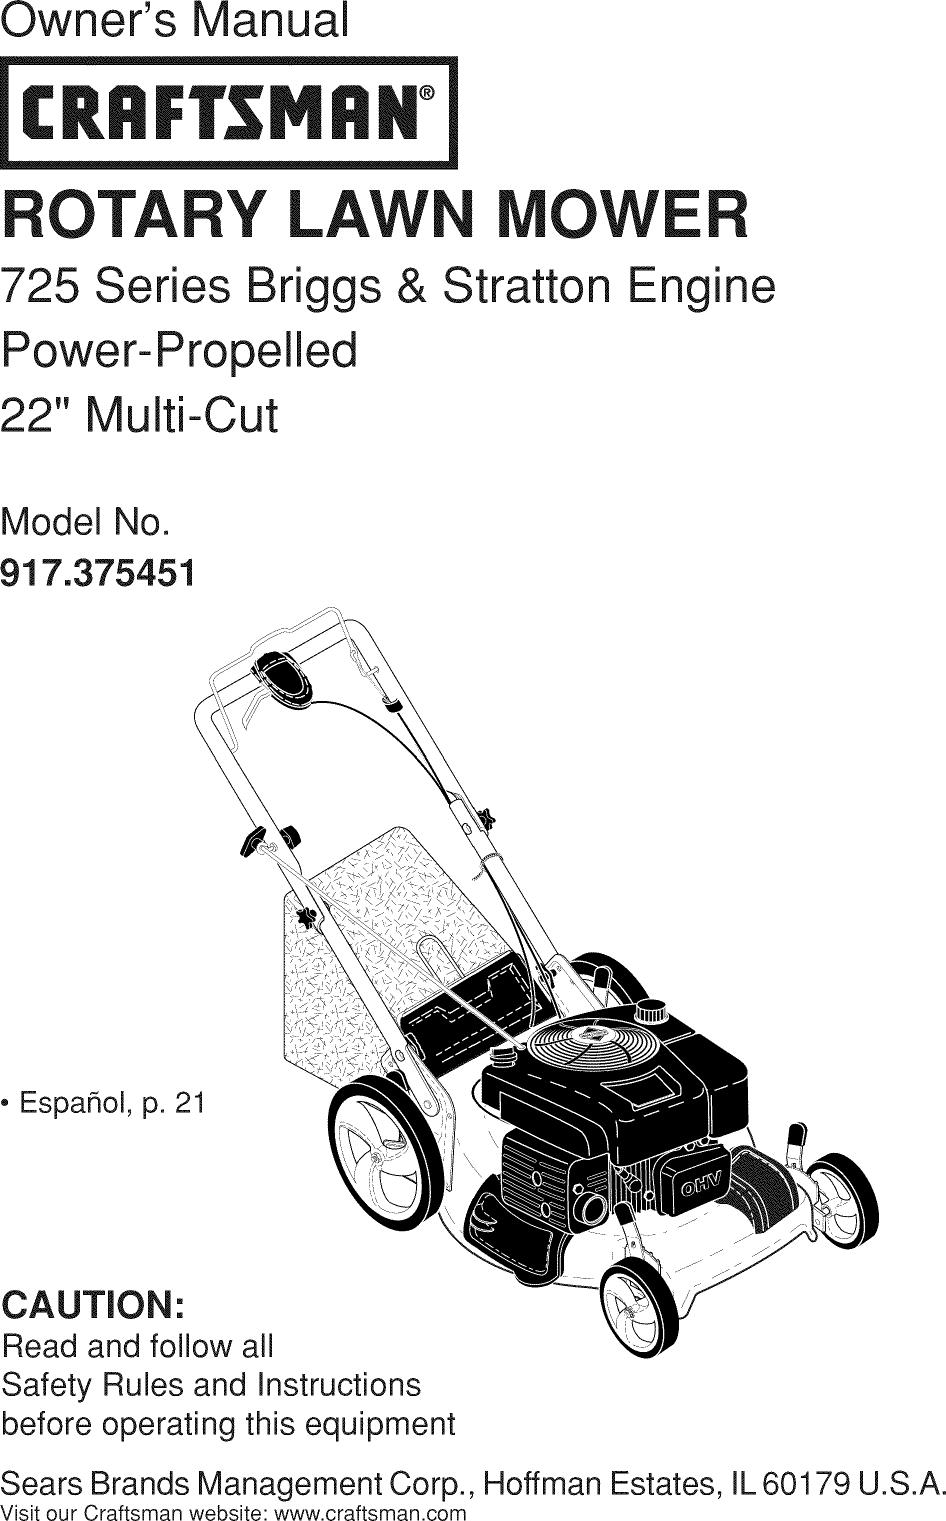 Craftsman 917375451 User Manual MOWER Manuals And Guides